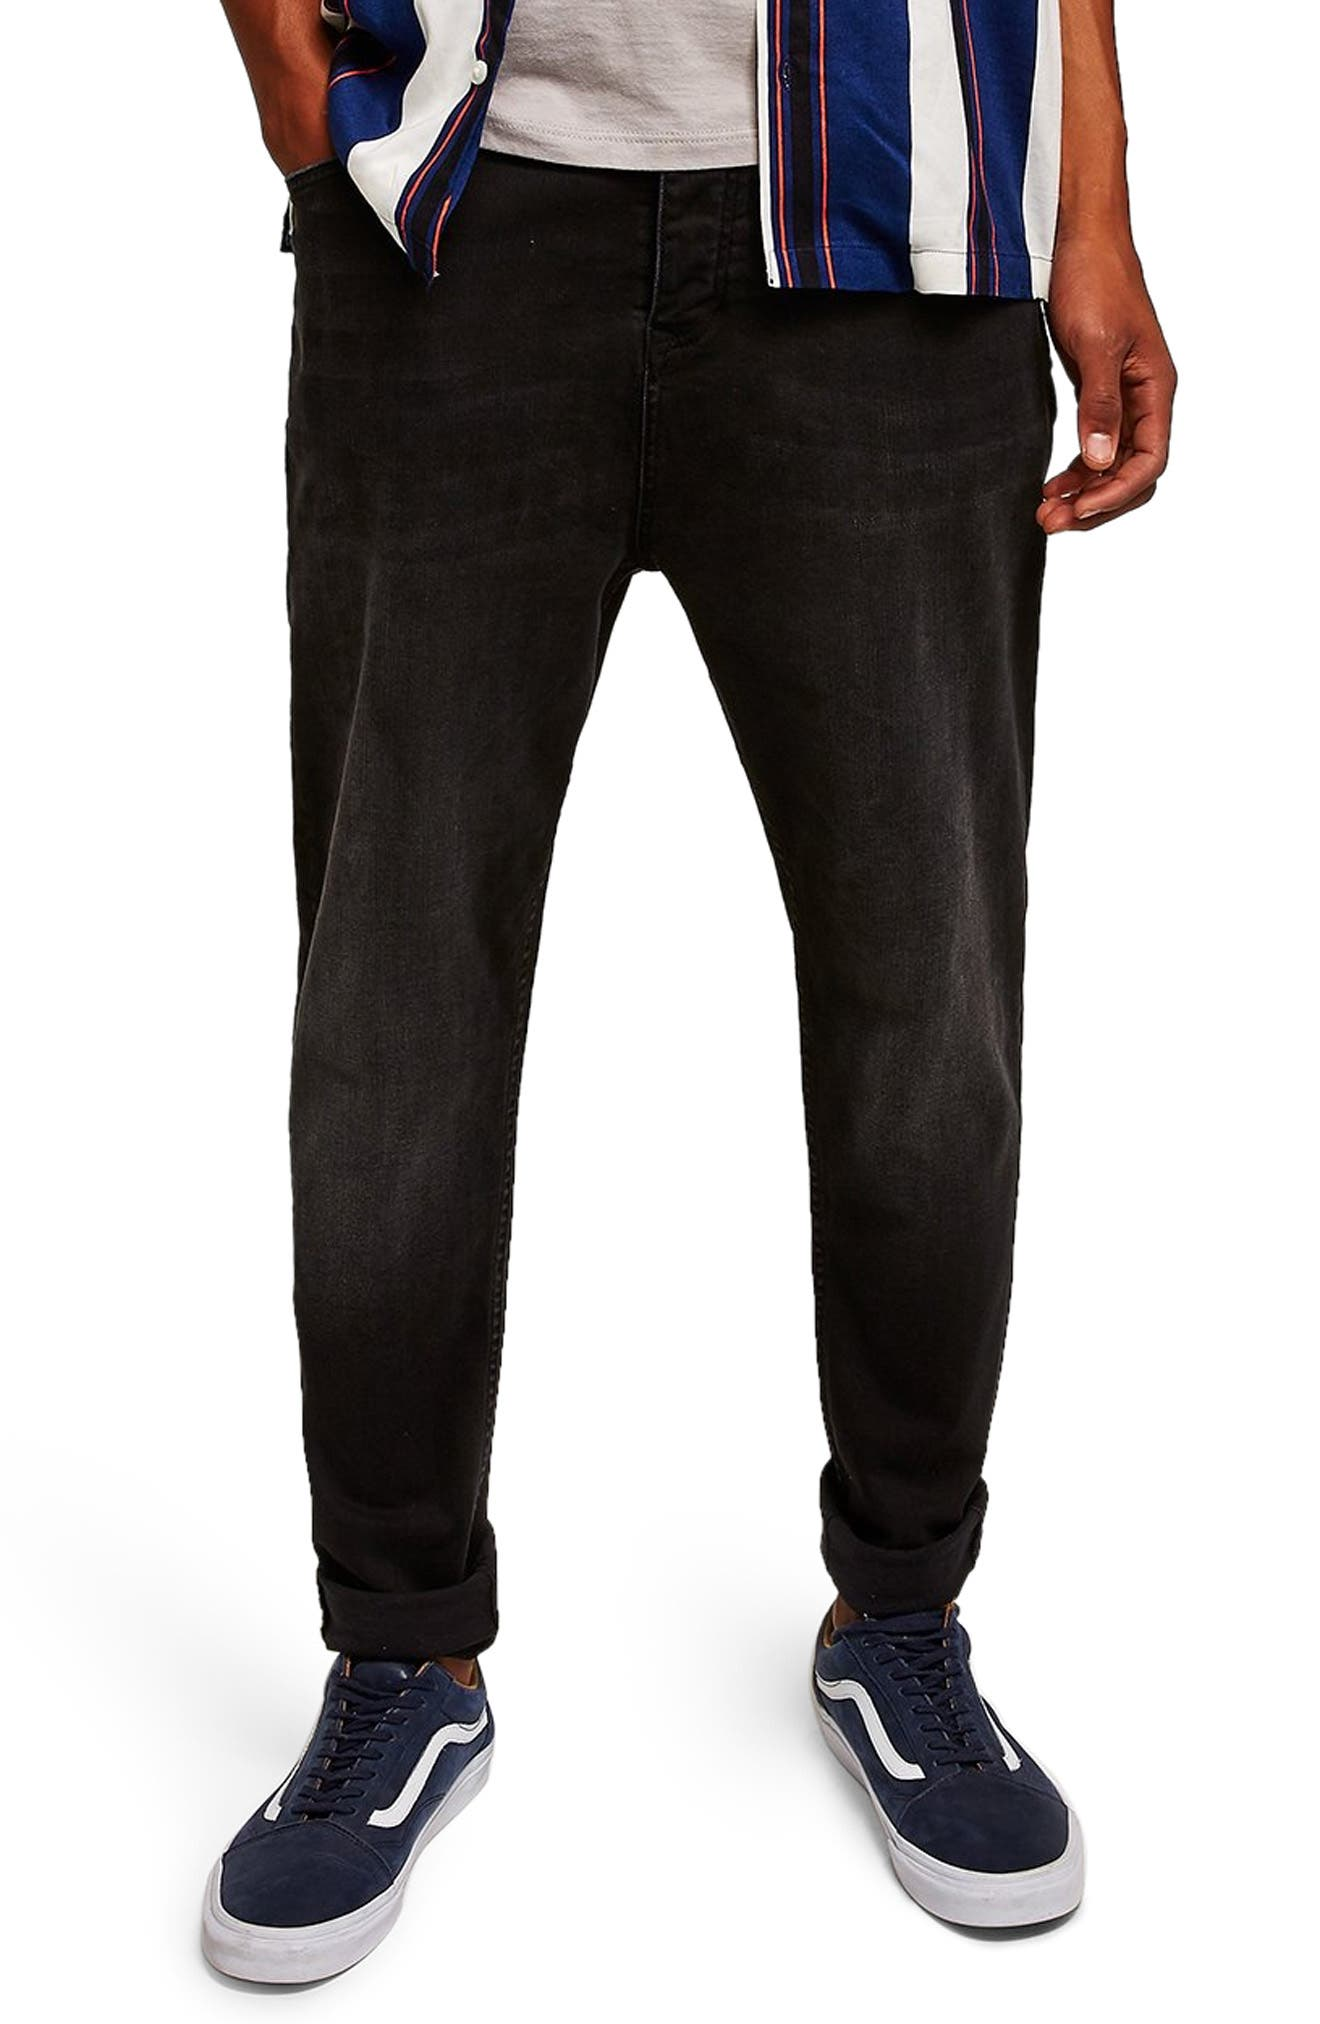 Topshop Jogger Skinny Jeans,                         Main,                         color, BLACK